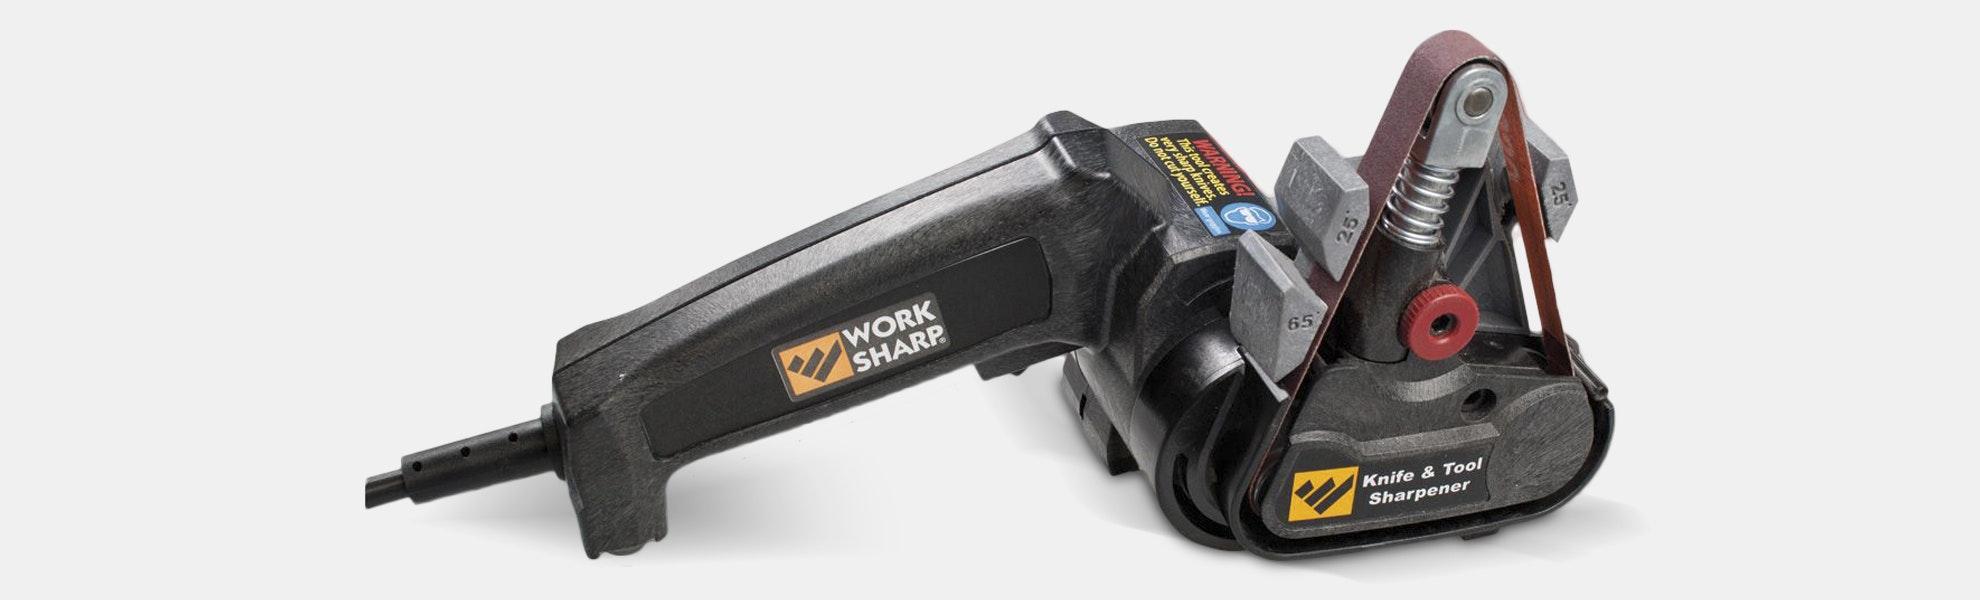 Work Sharp Knife & Tool Sharpening System